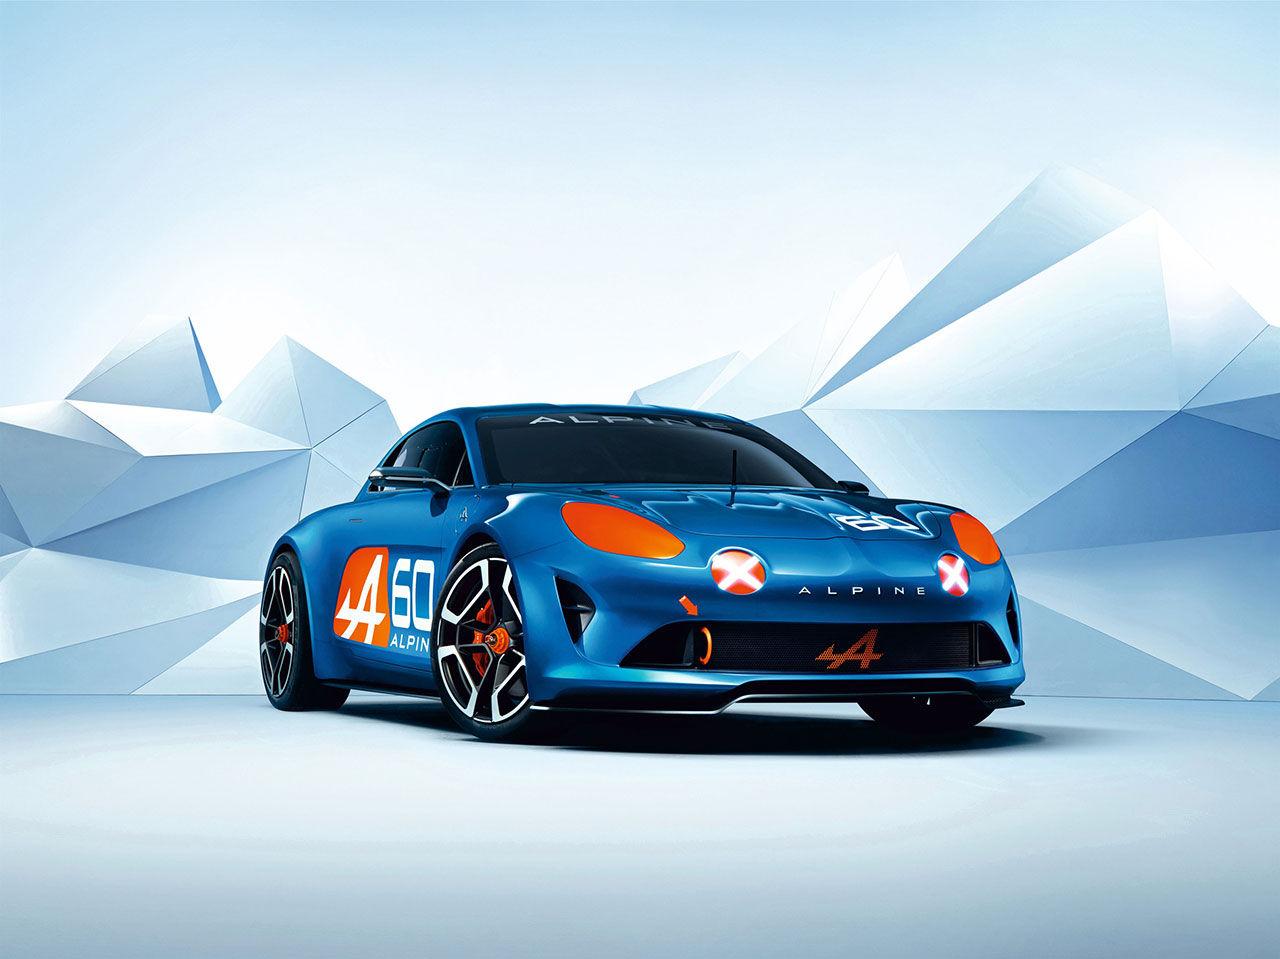 Renault visar konceptbilen Alpine Celebration